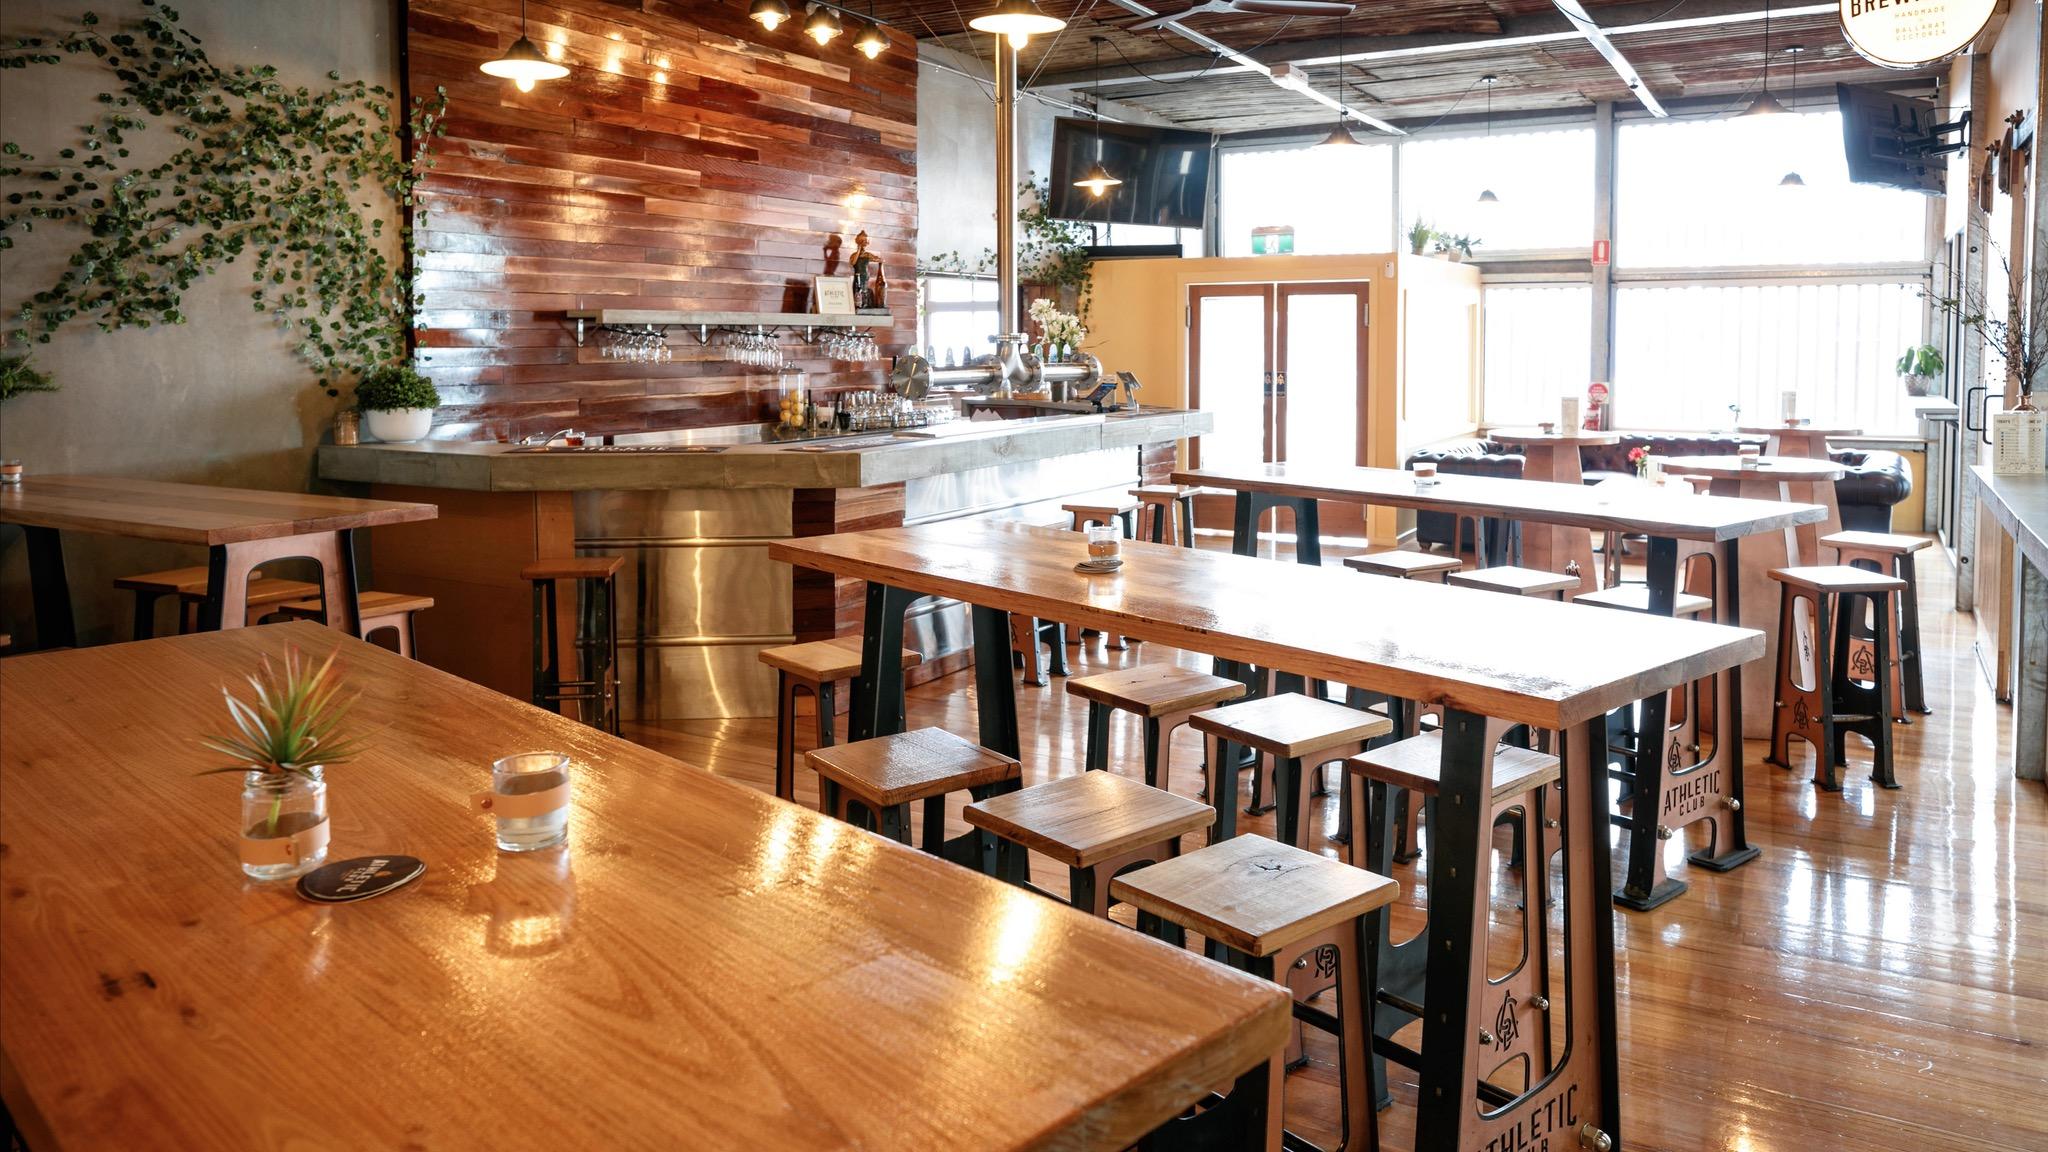 Athletic Club Brewery - Tap Room 2